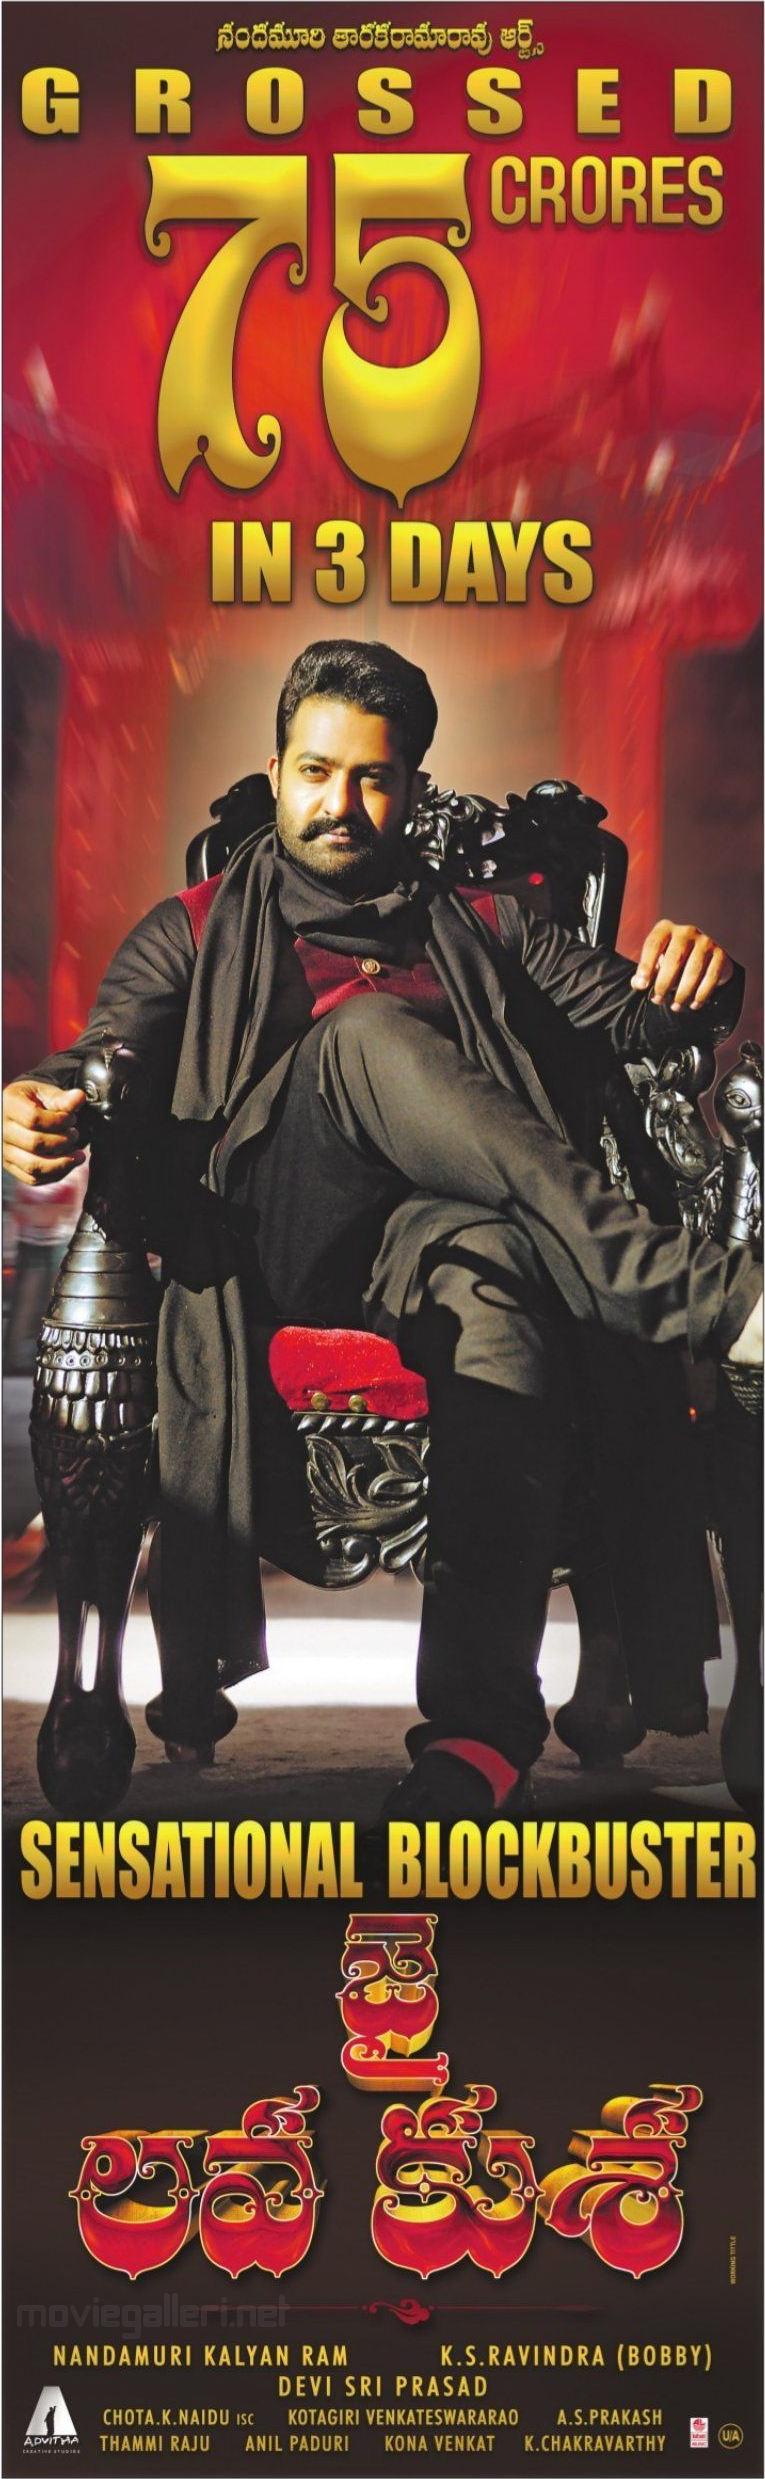 Jr NTR Jai Lava Kusa crossed 75 crores in 3 Days Poster